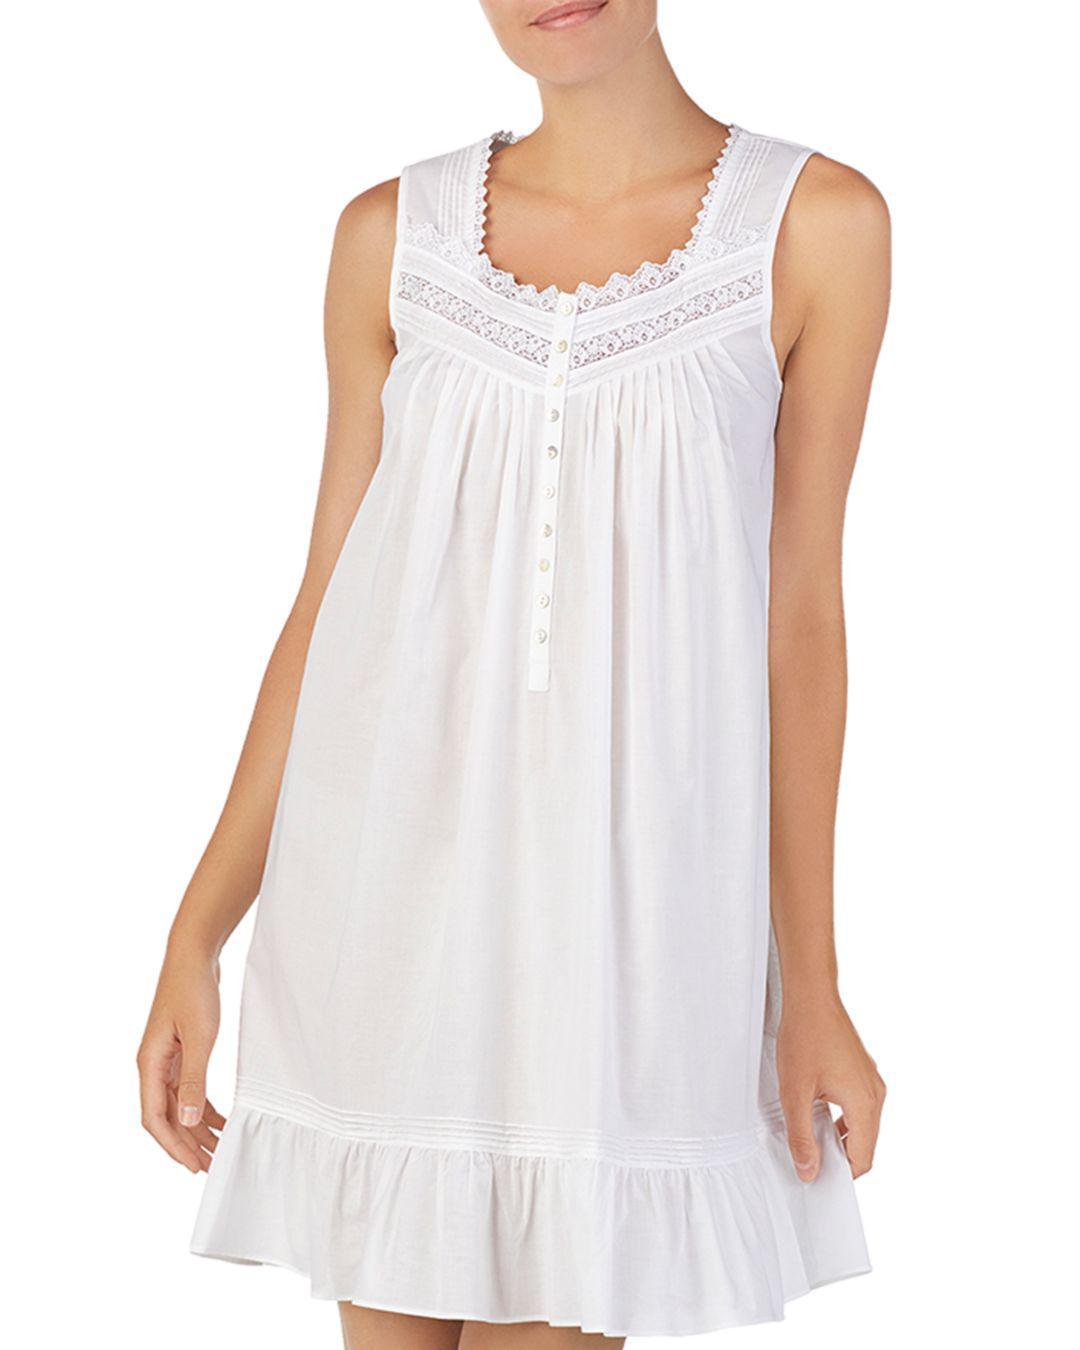 06efb3afba Eileen West Sleeveless Short Cotton Ballet Nightgown in White - Lyst